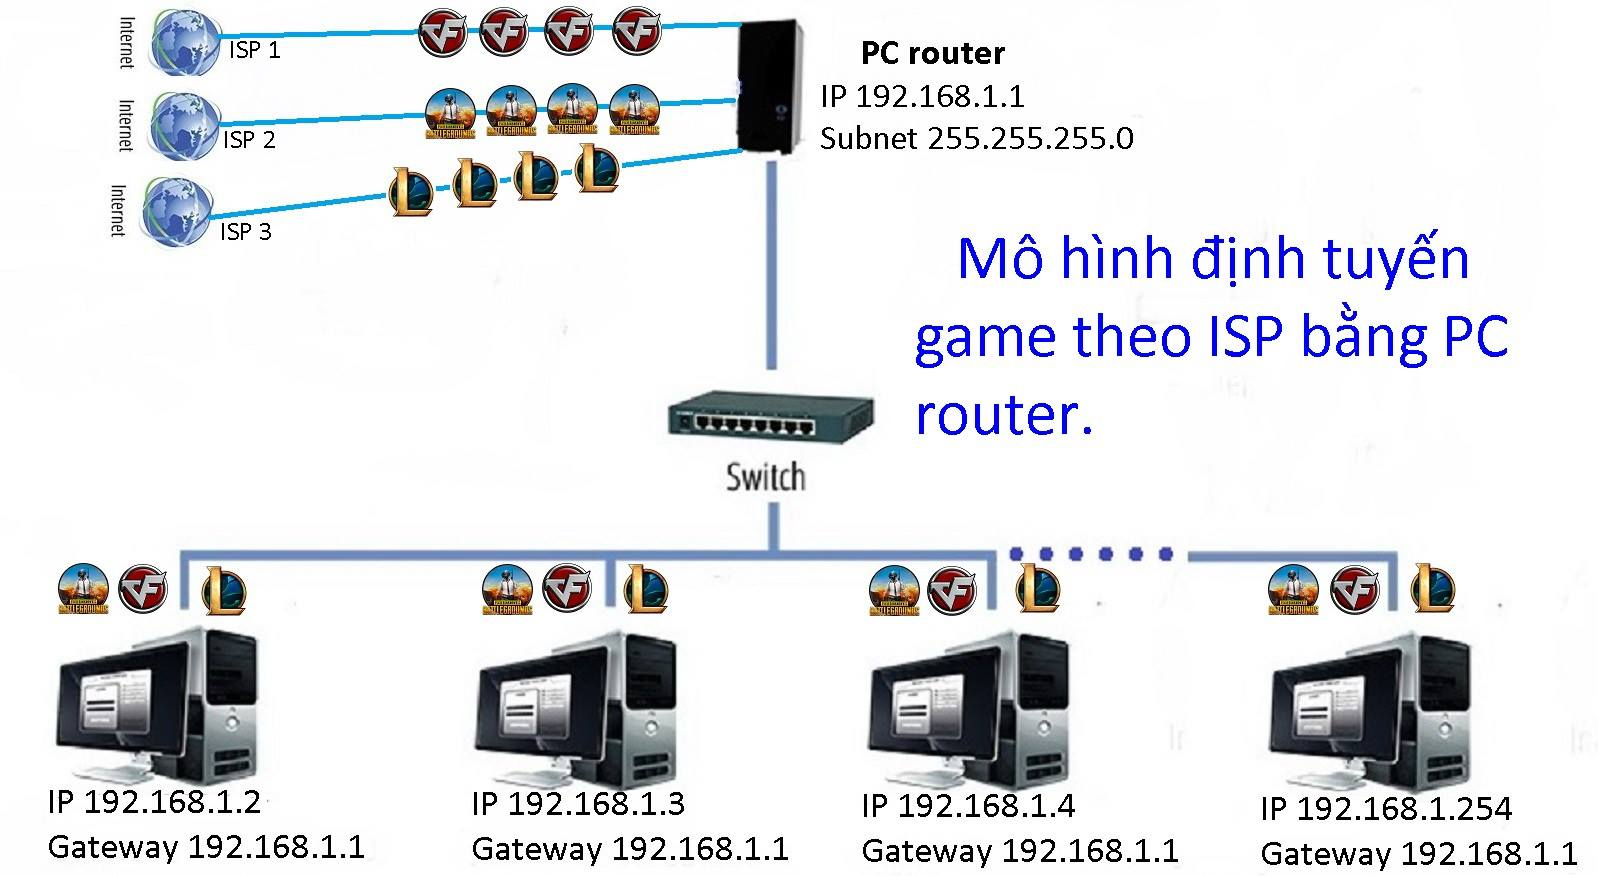 Định tuyến game online theo ISP